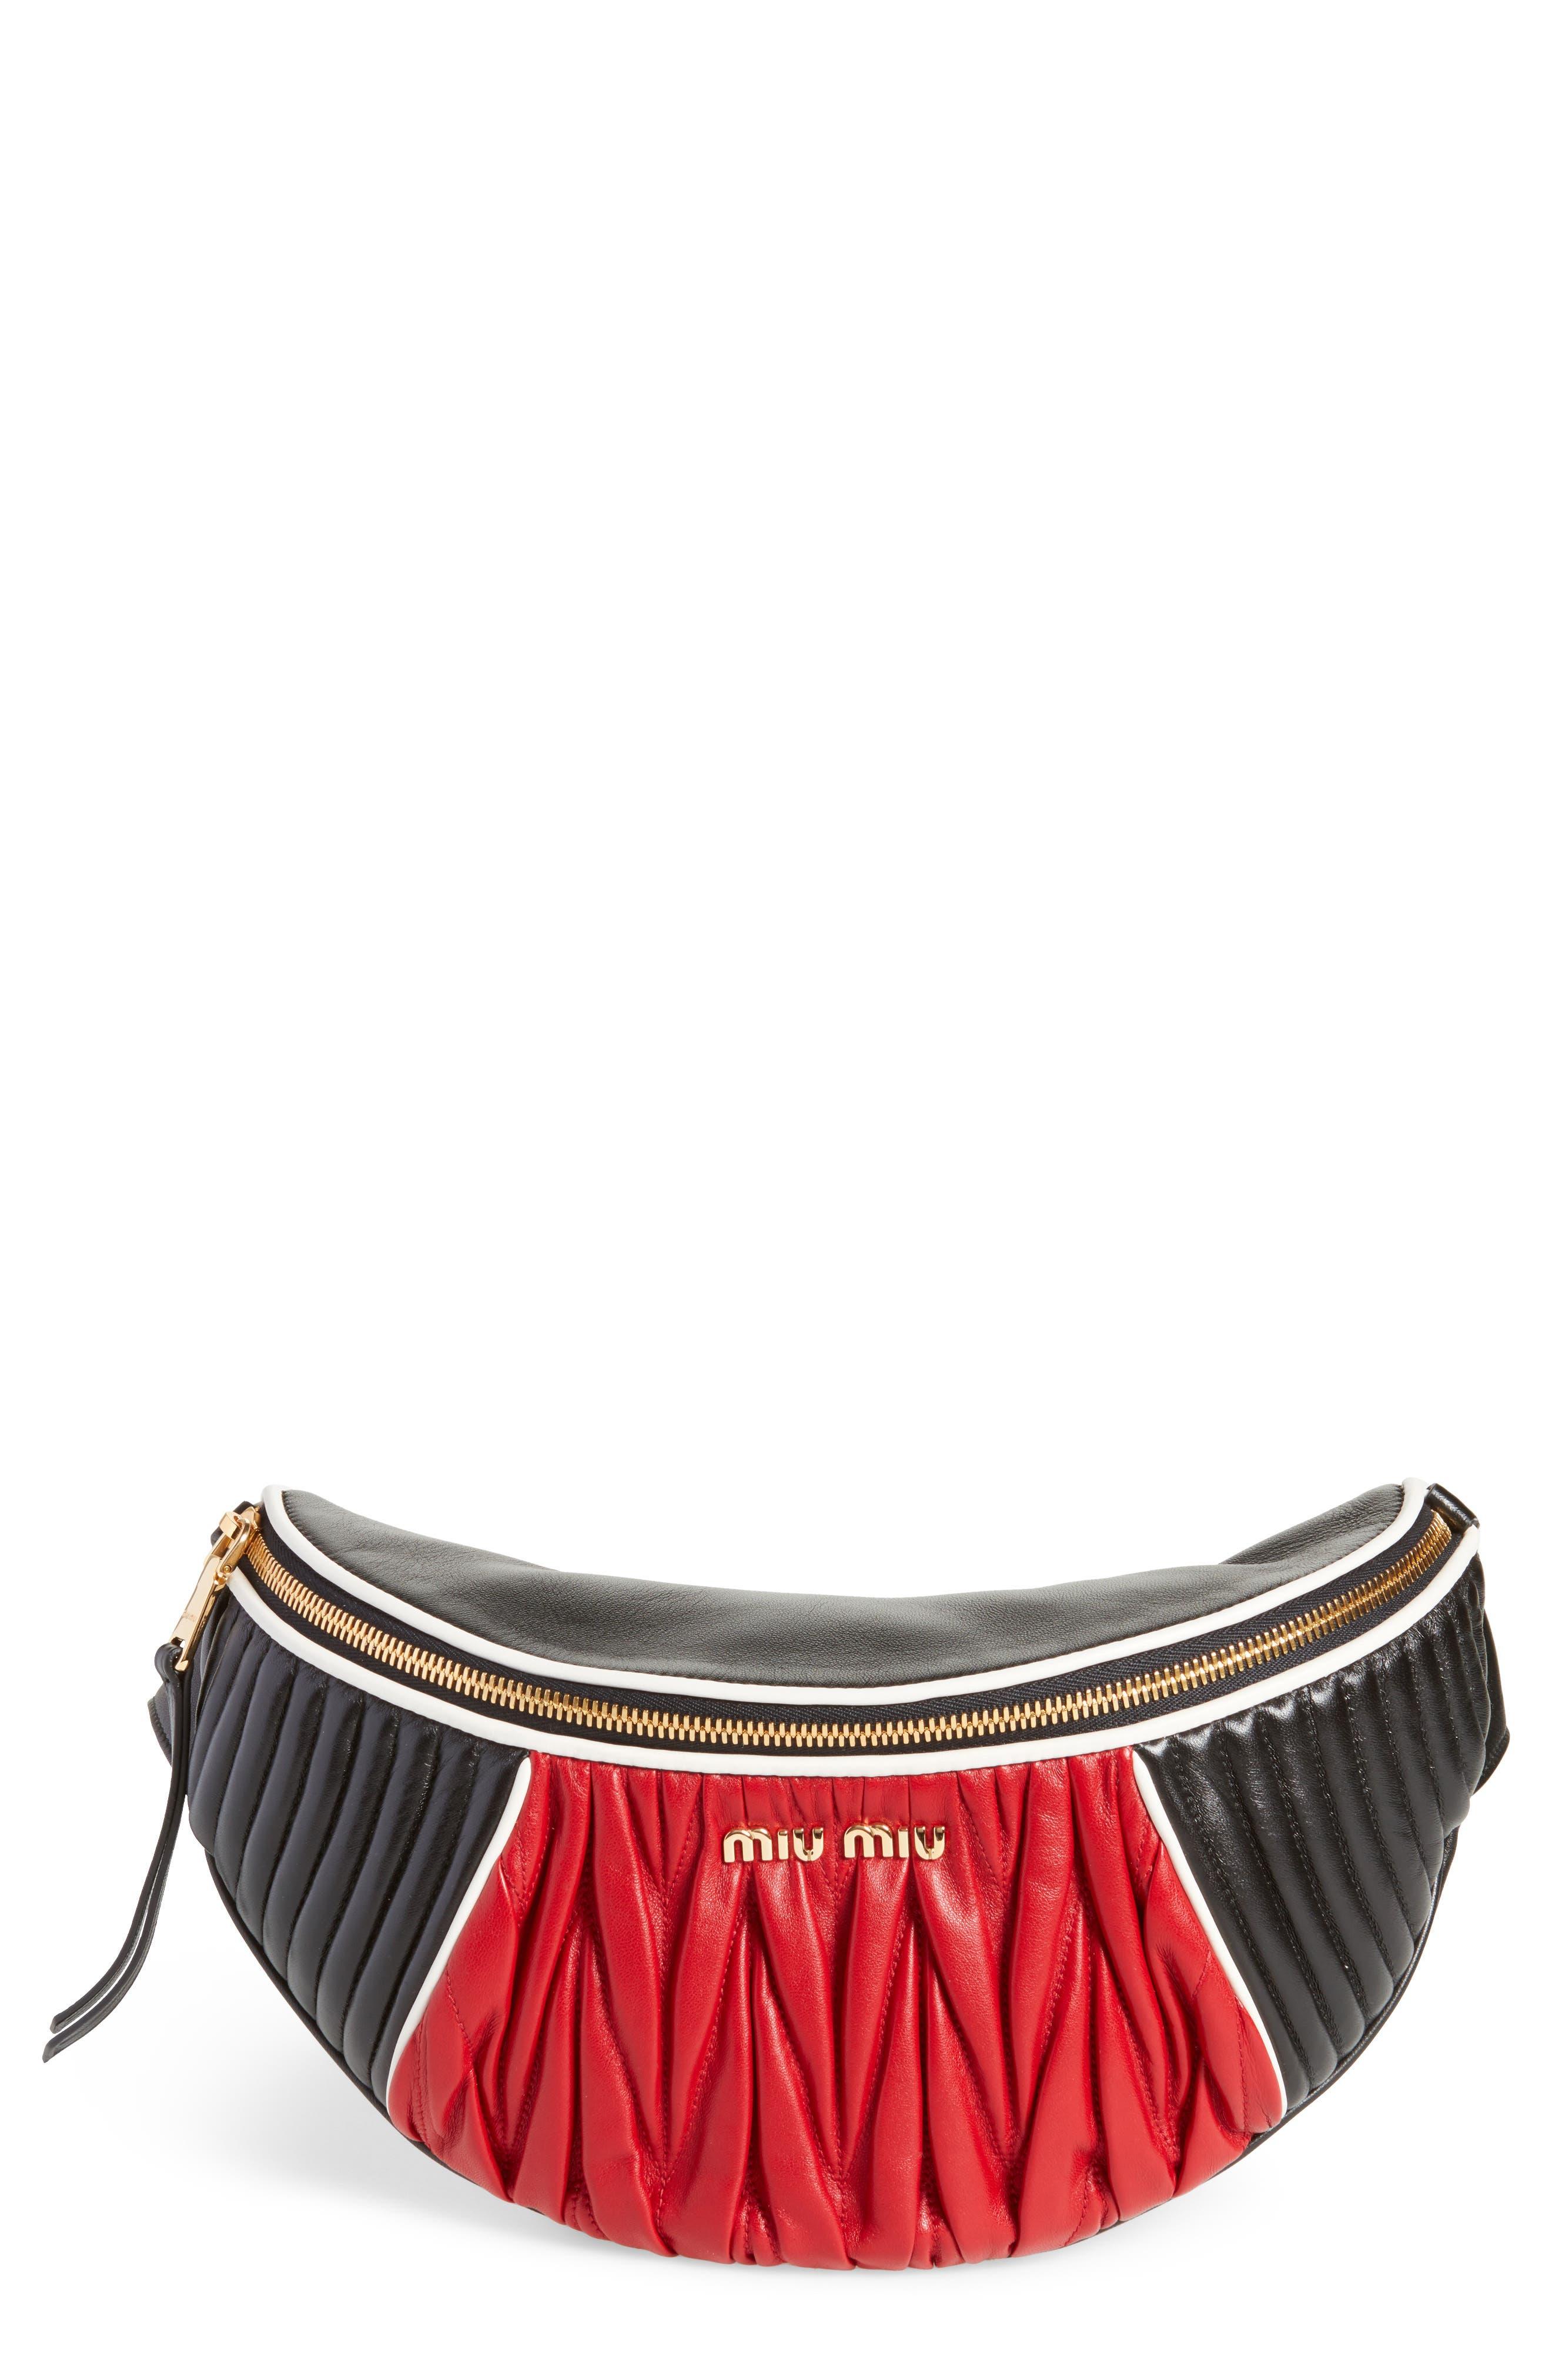 Miu Miu Rider Matelassé Leather Belt Bag